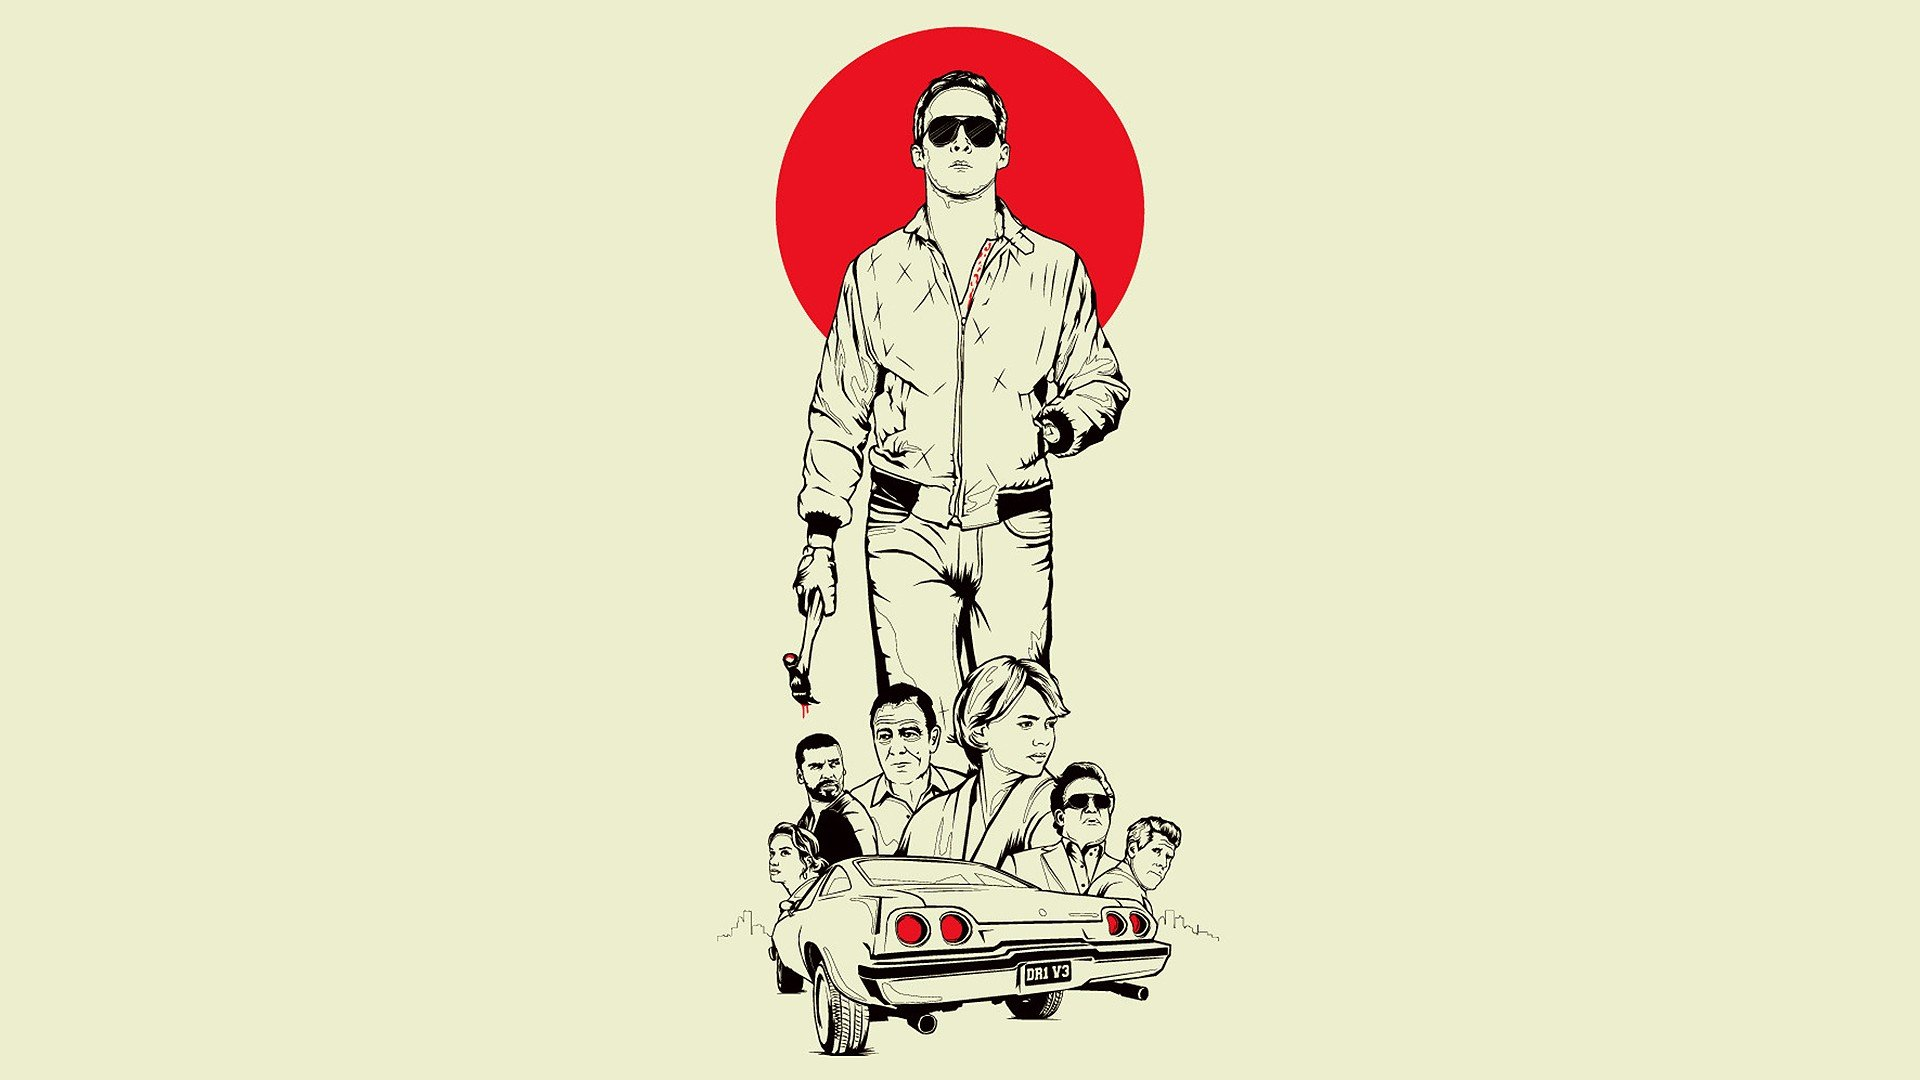 Movies drive Ryan Gosling fan art Drive (movie) wallpaper   1920x1080 ...